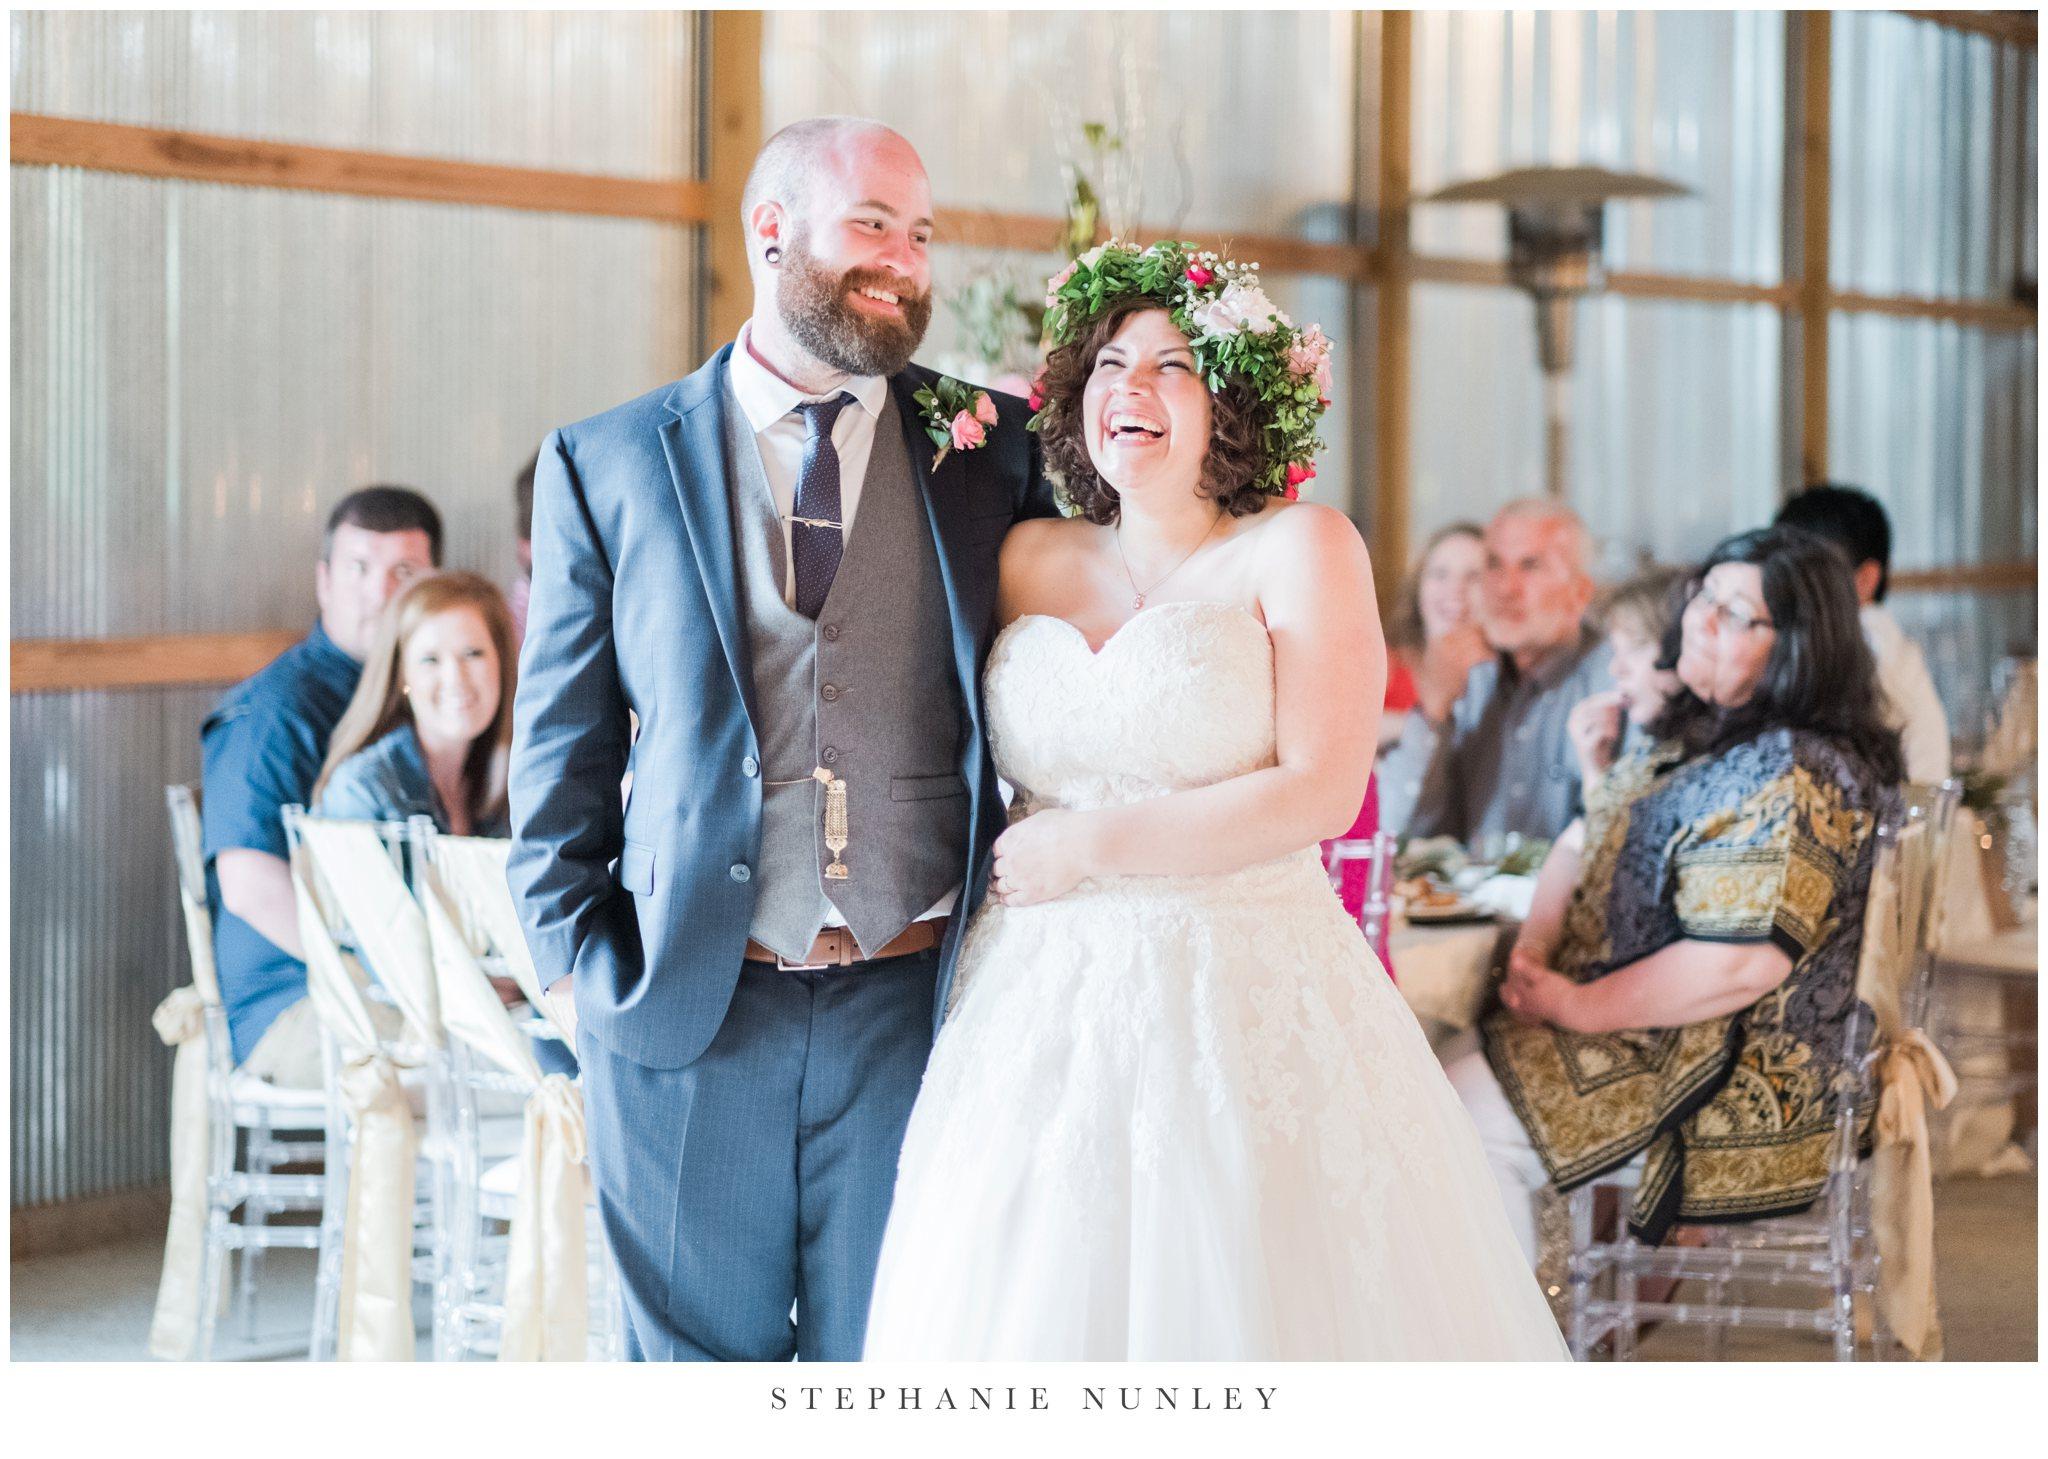 romantic-outdoor-wedding-with-flower-crown-0138.jpg